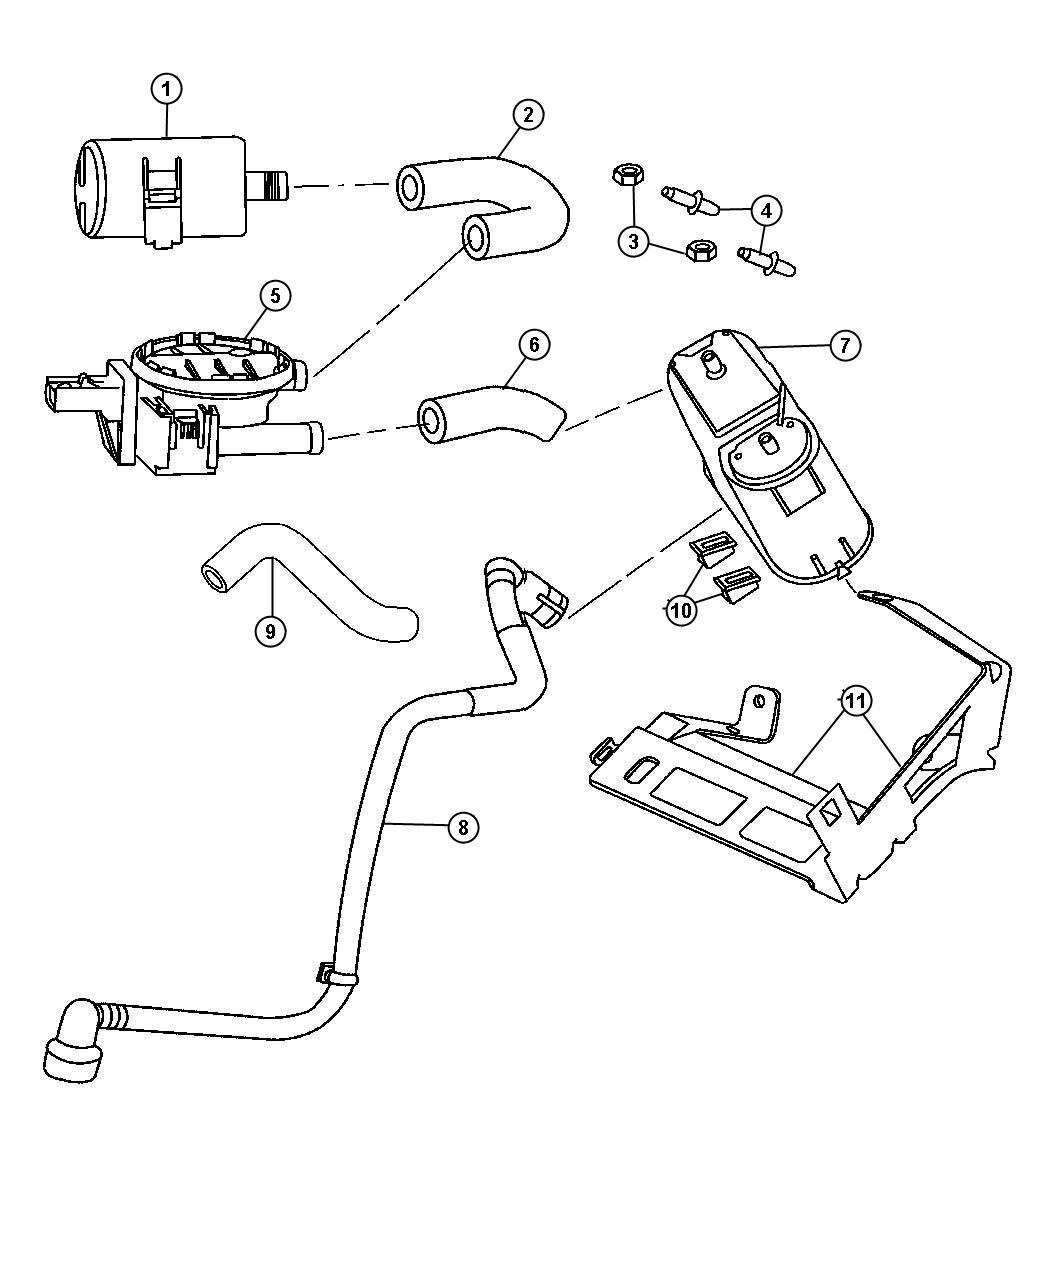 Dodge Charger Canister. Vapor. Emissions, state, federal